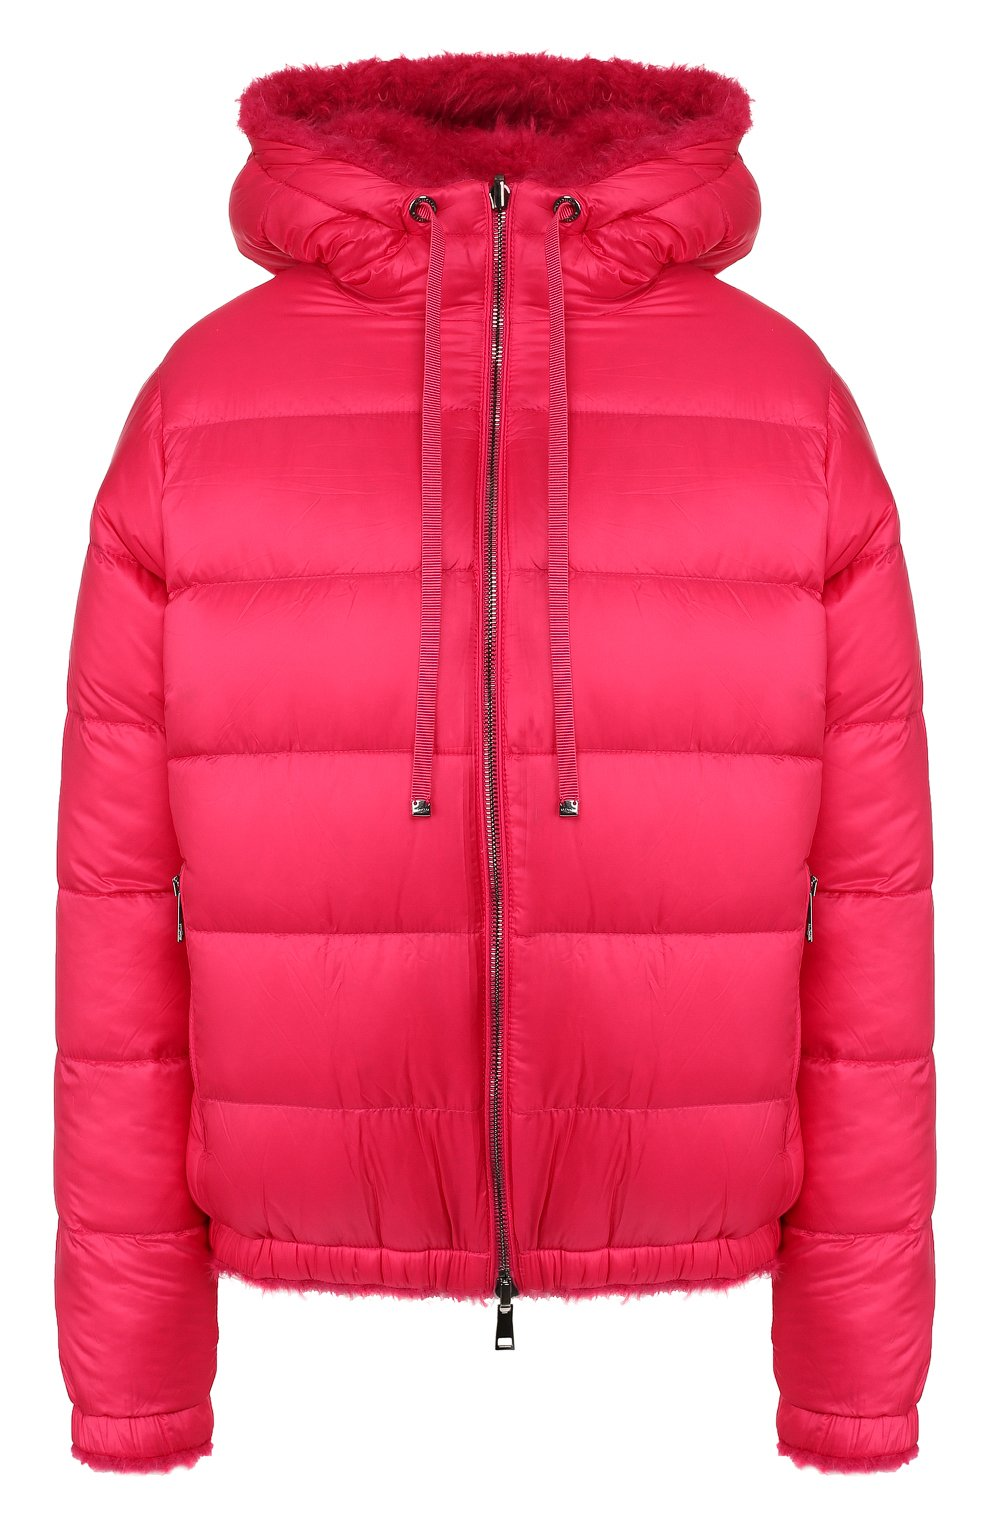 Женский куртка moncler kolima MONCLER розового цвета, арт. E2-093-46402-10-C0207 | Фото 1